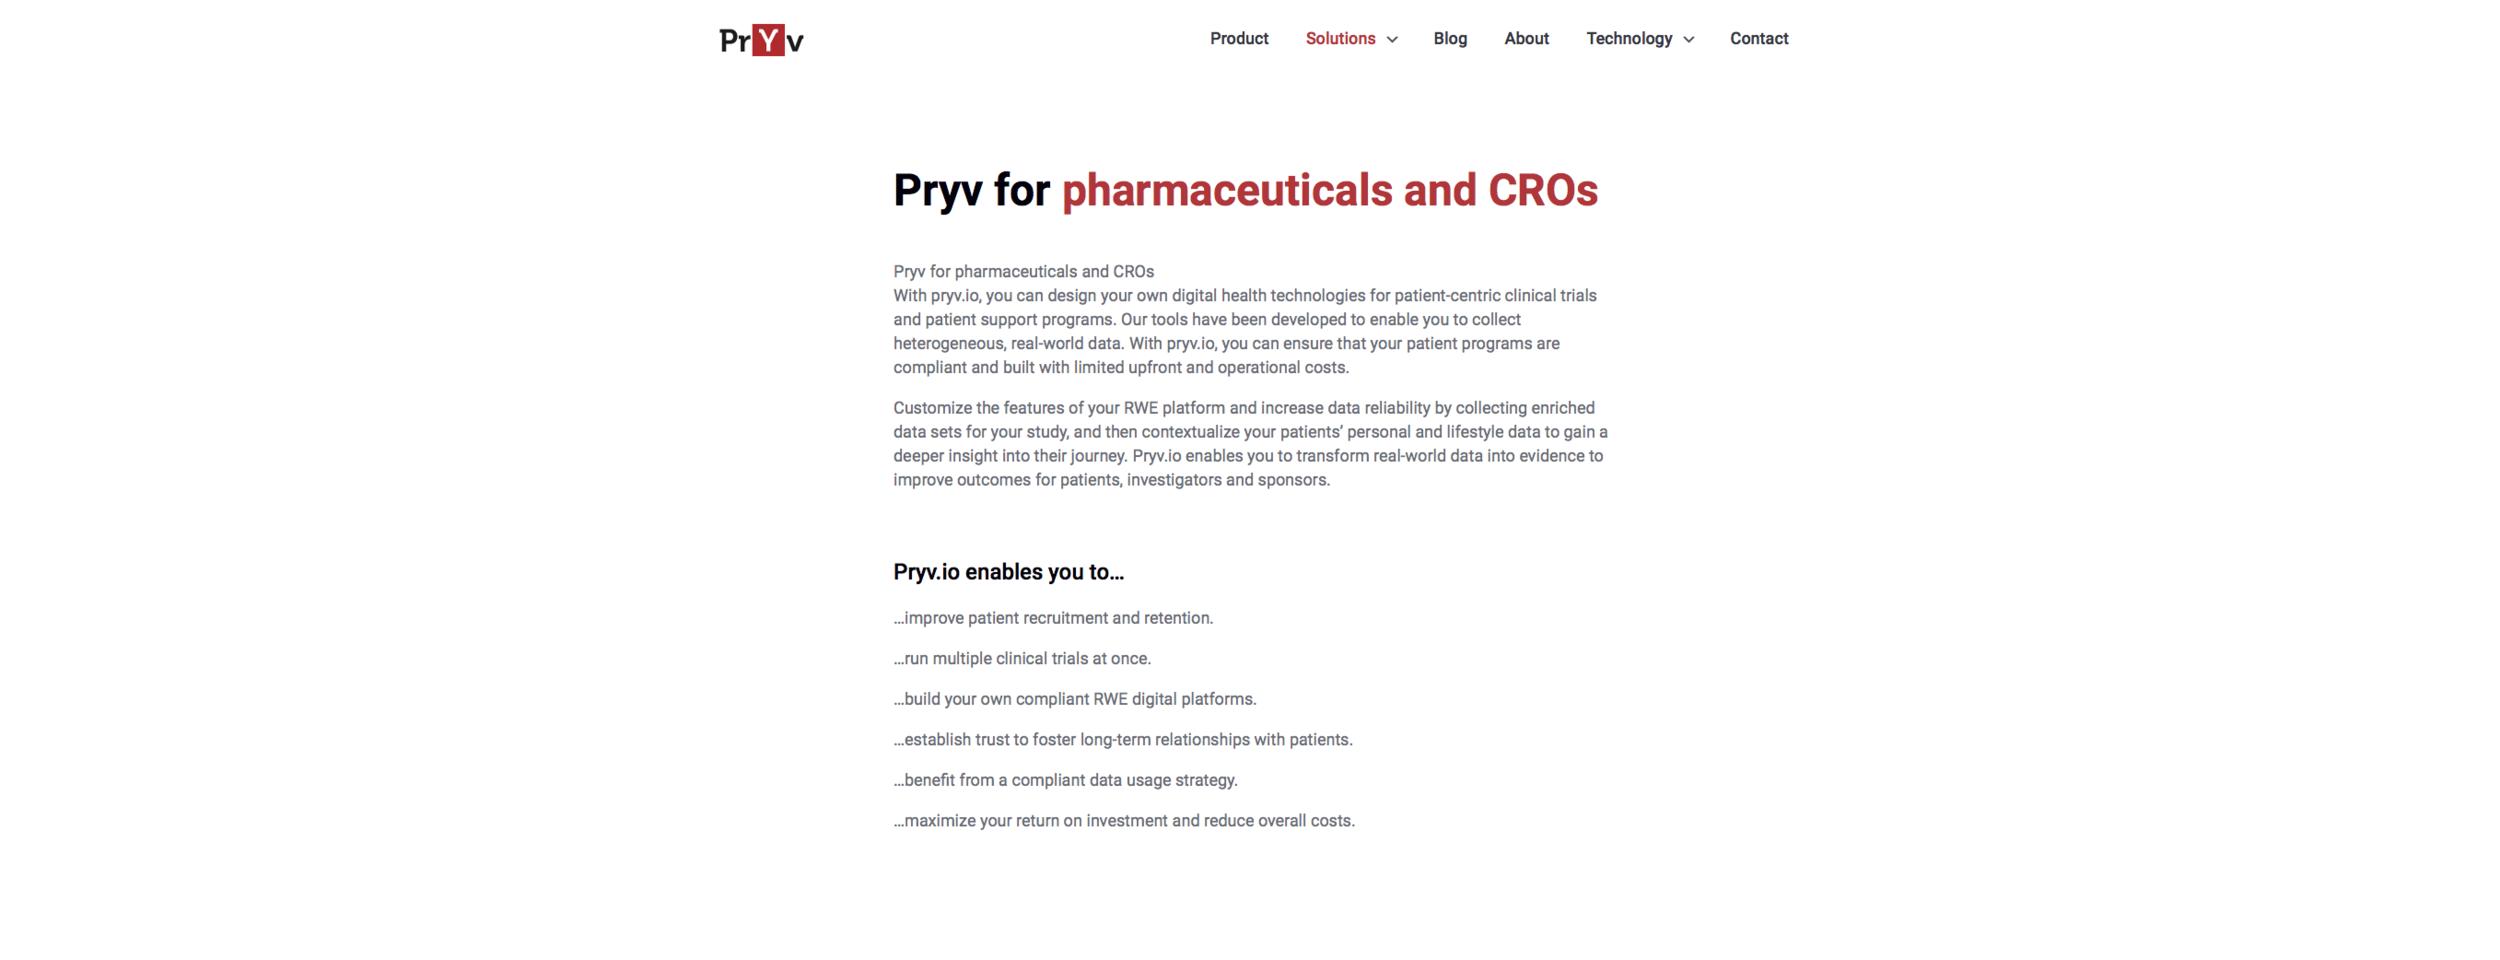 Solutions _ pharma (screenshot).png